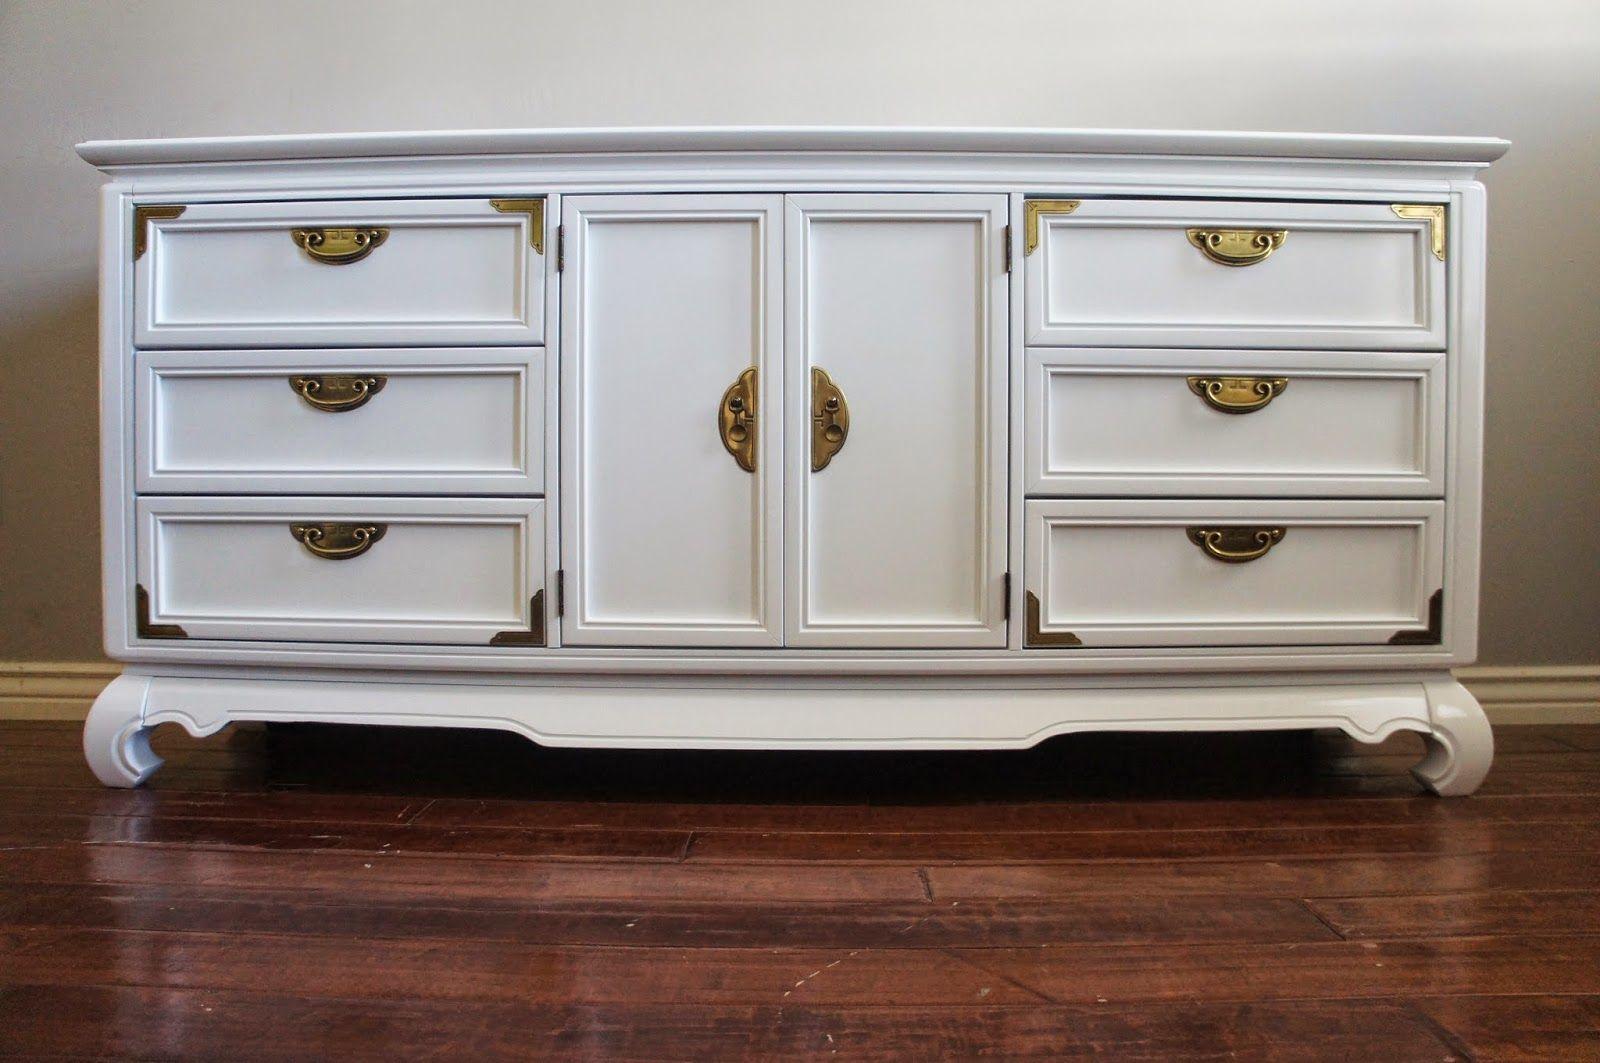 European Paint Finishes Vintage Modern High Gloss White Lacquered Brass Dresser Modern Furniture Makeover High Gloss White Lacquer Furniture Inspiration [ 1063 x 1600 Pixel ]